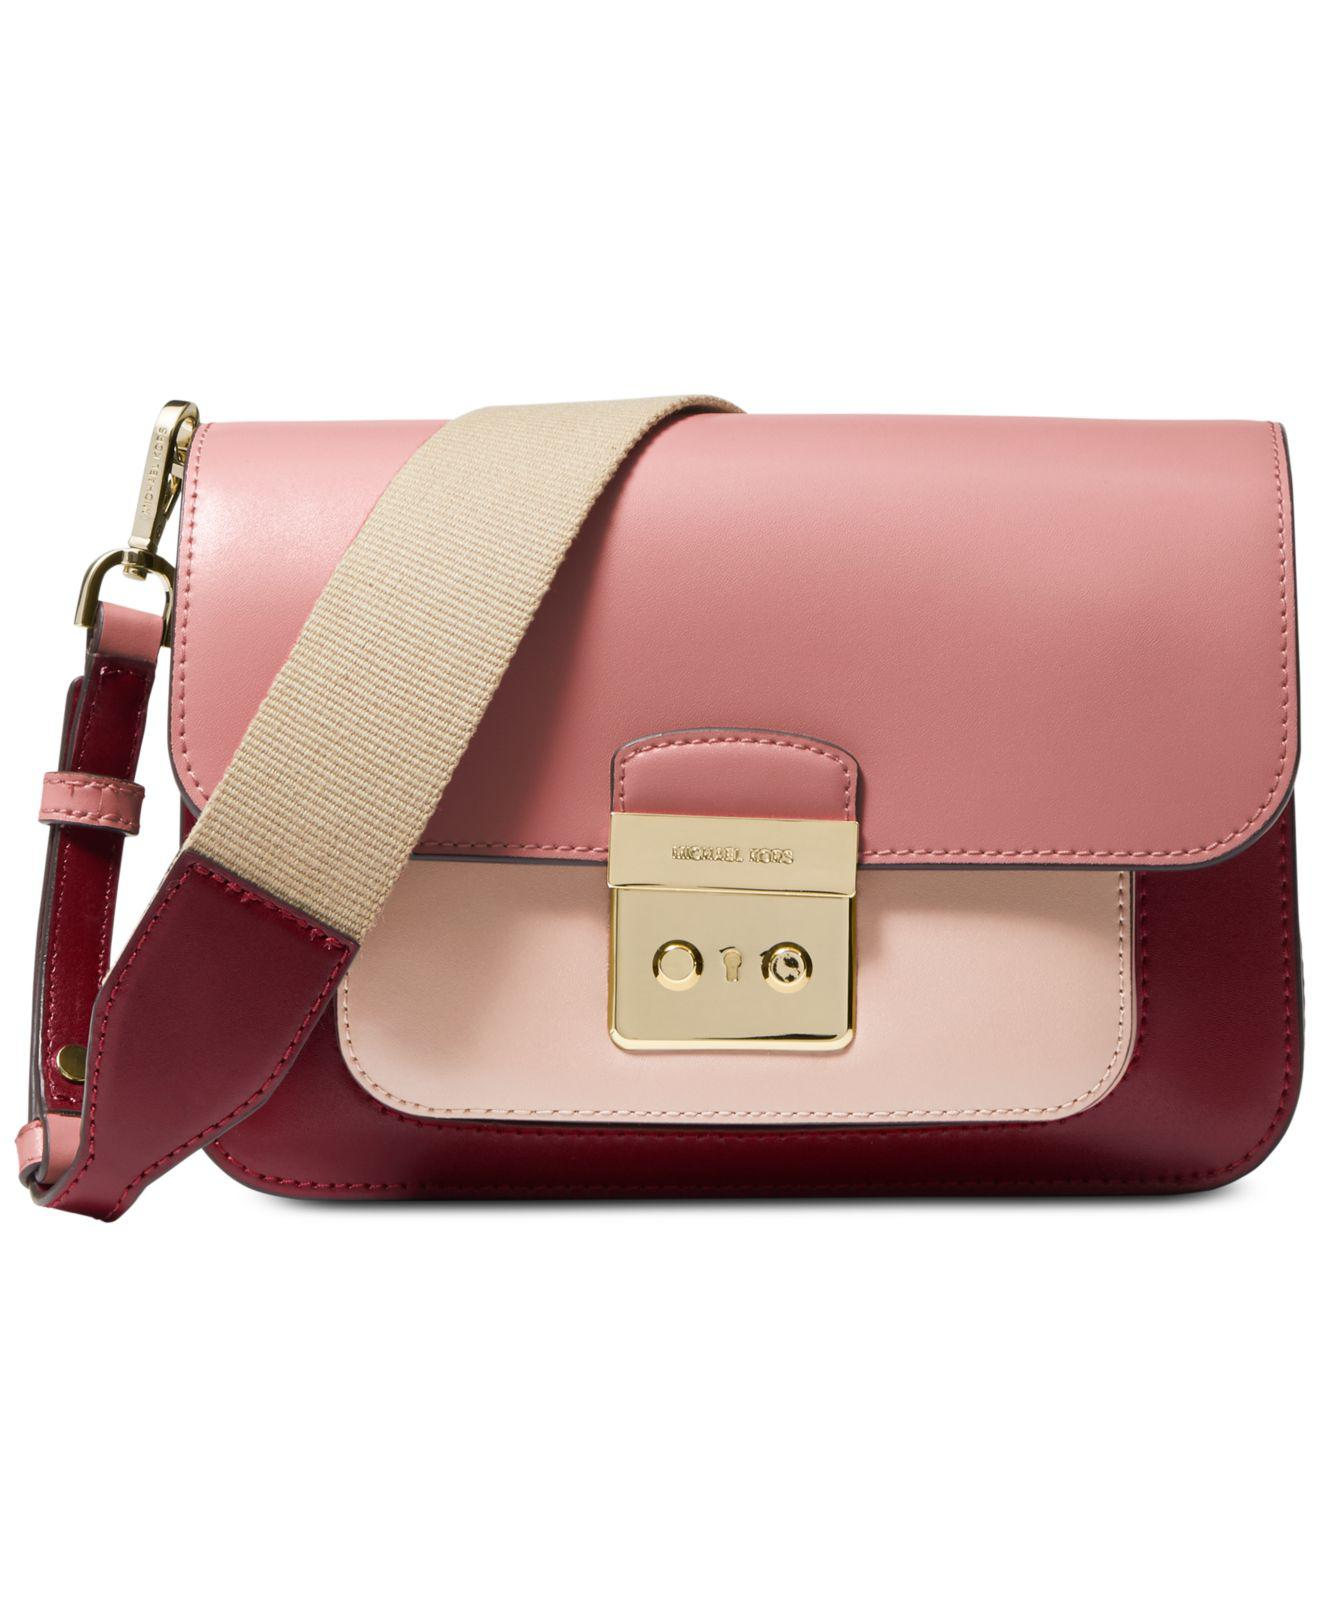 e1f7f756de71 Michael Kors. Women s Pink Michael Sloan Editor Colorblock Leather Shoulder  Bag